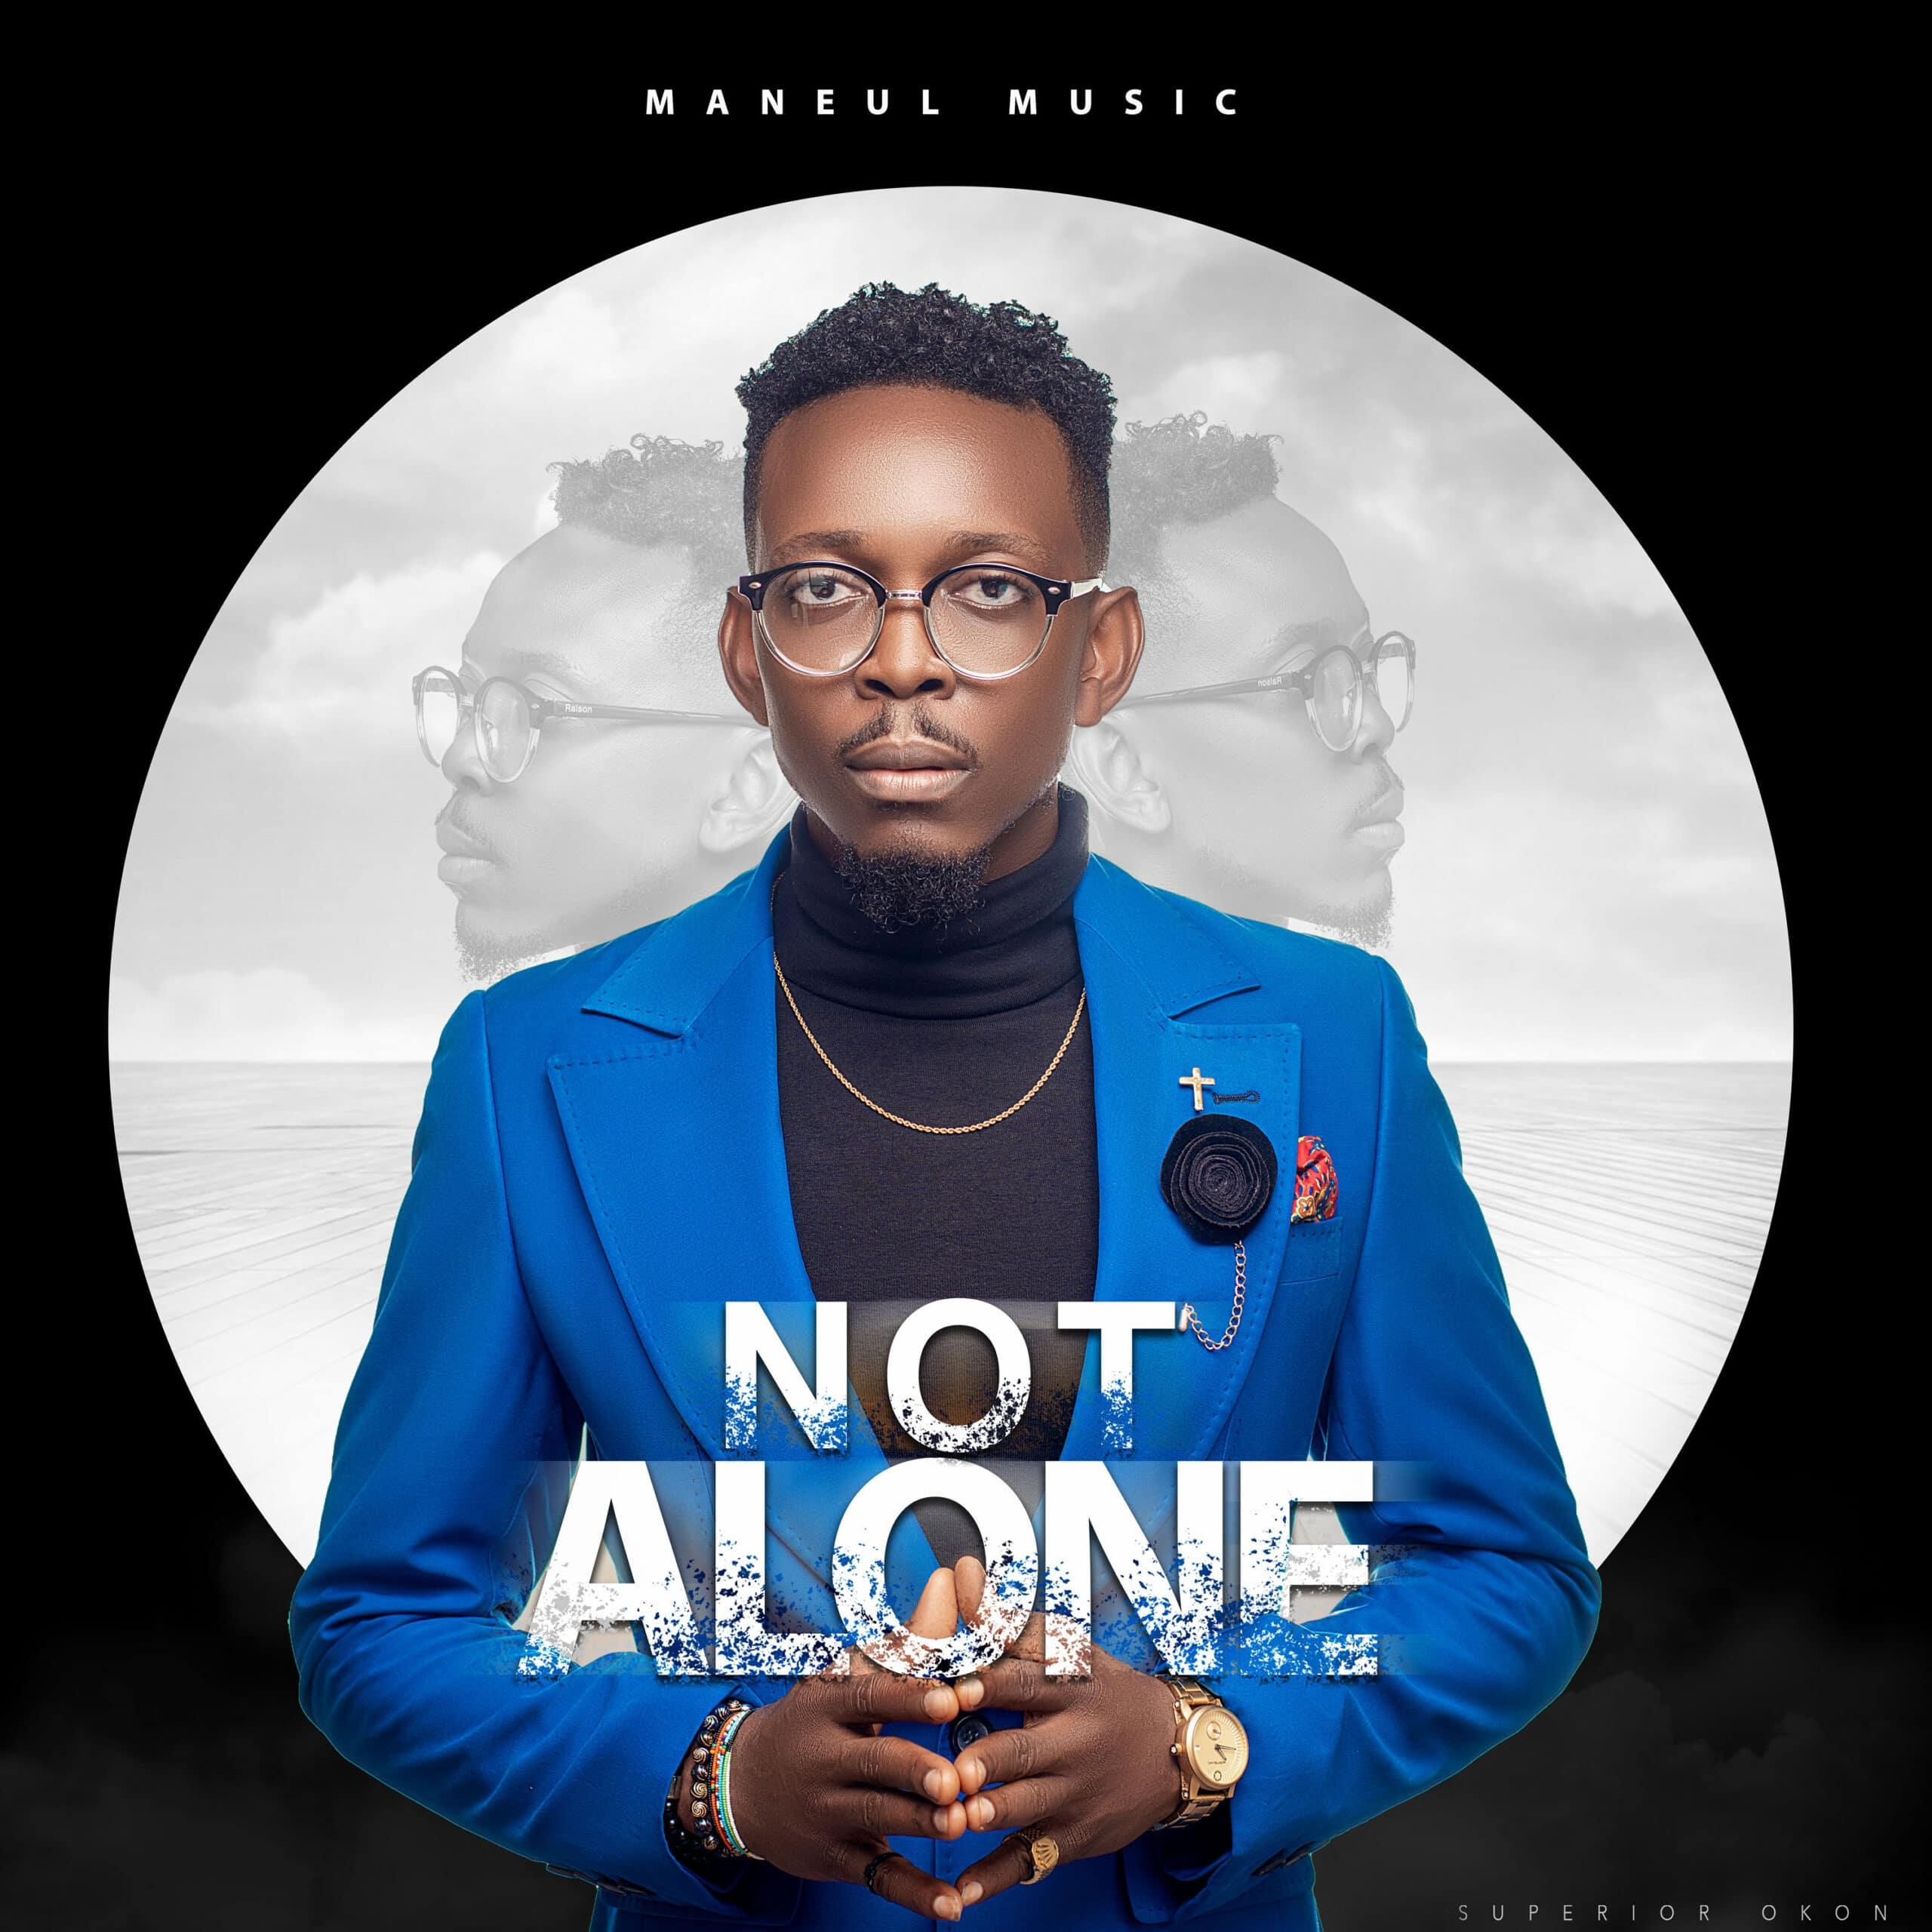 Manuel Music - Not Alone